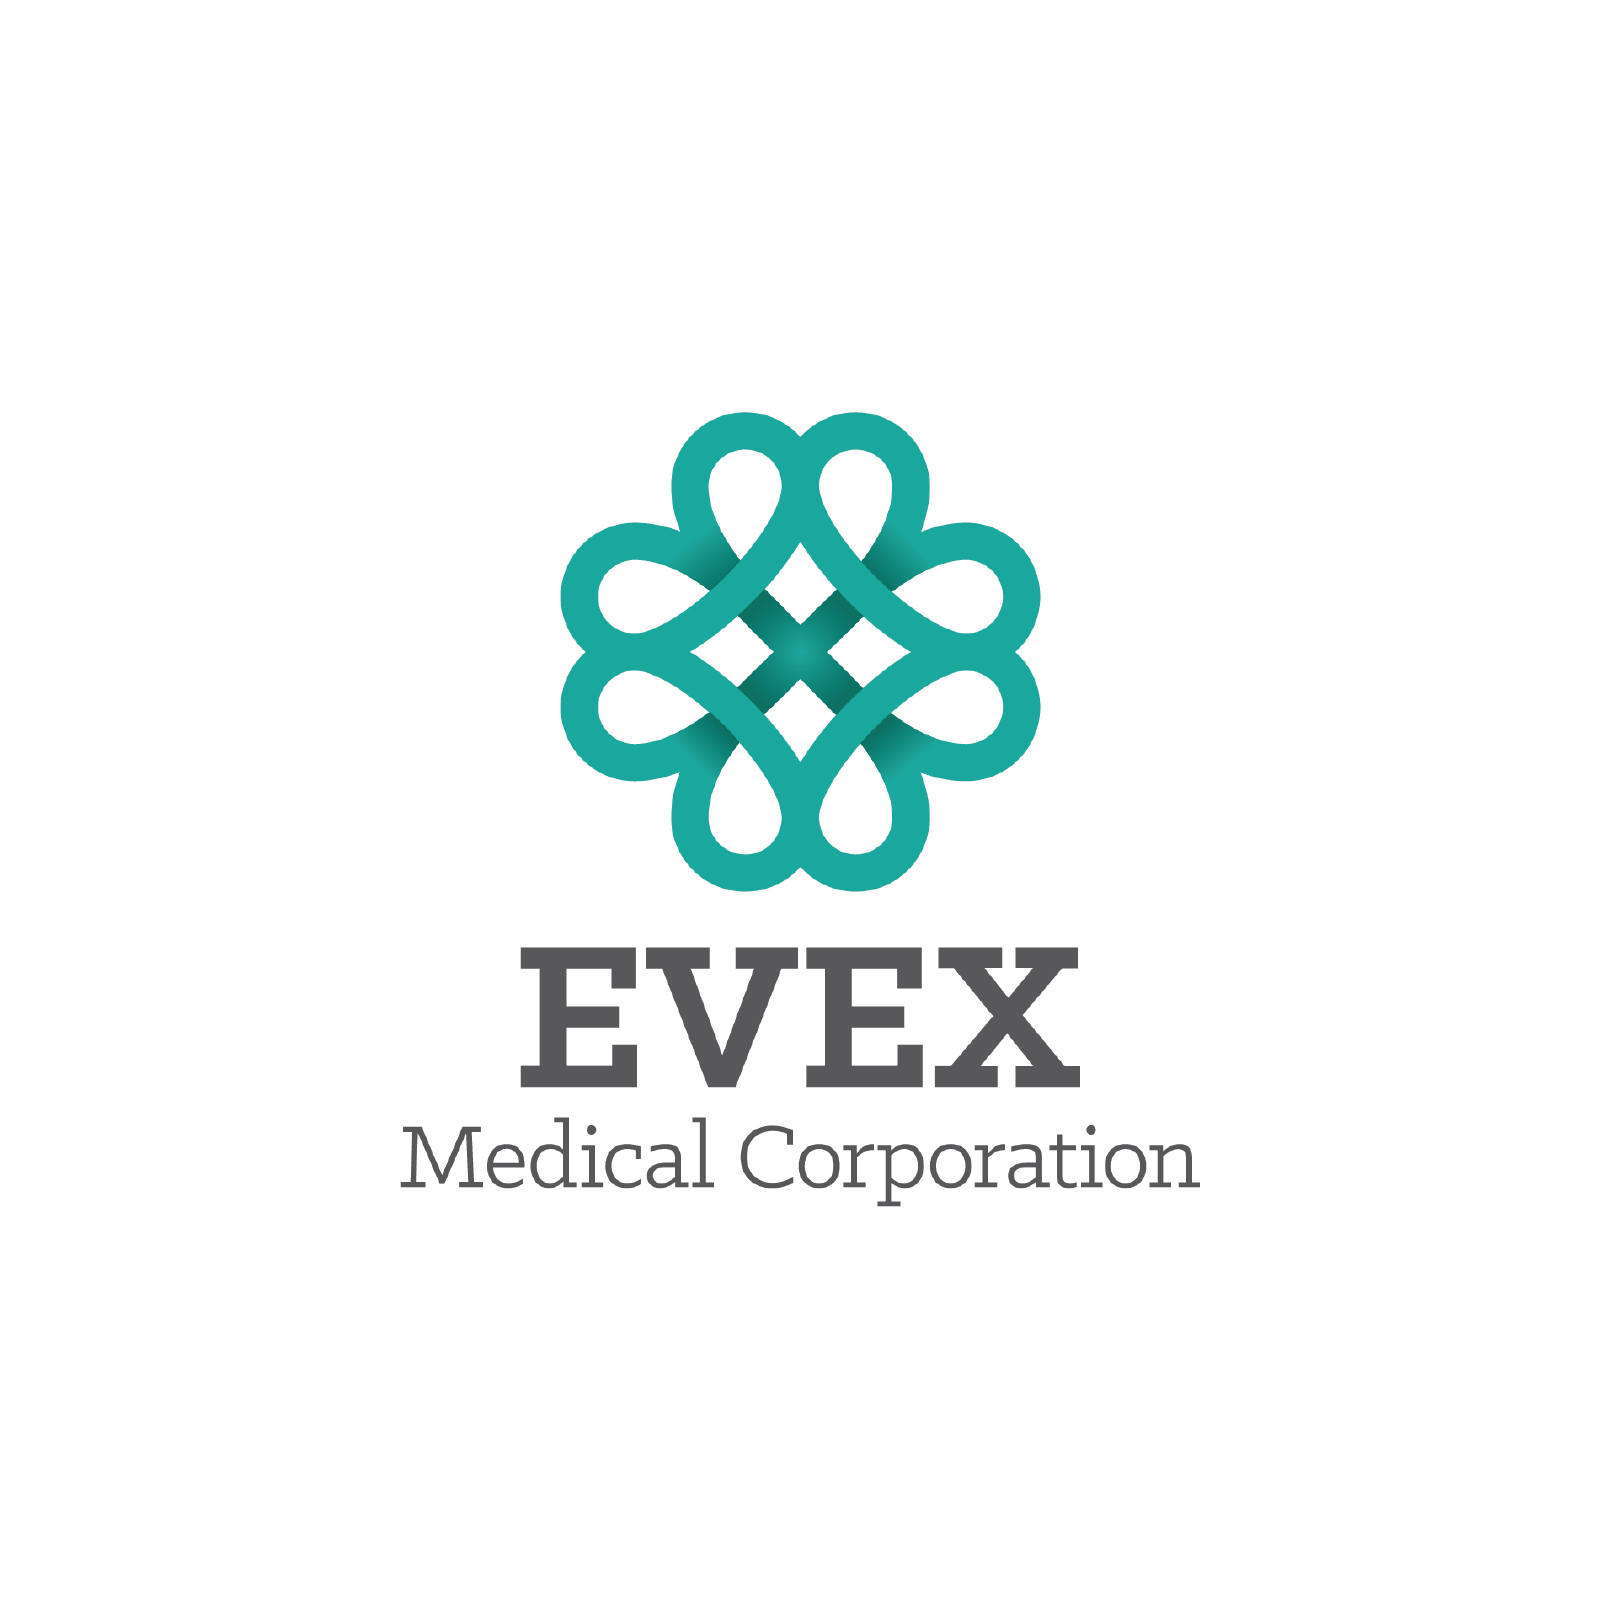 Evex Medical Corporation